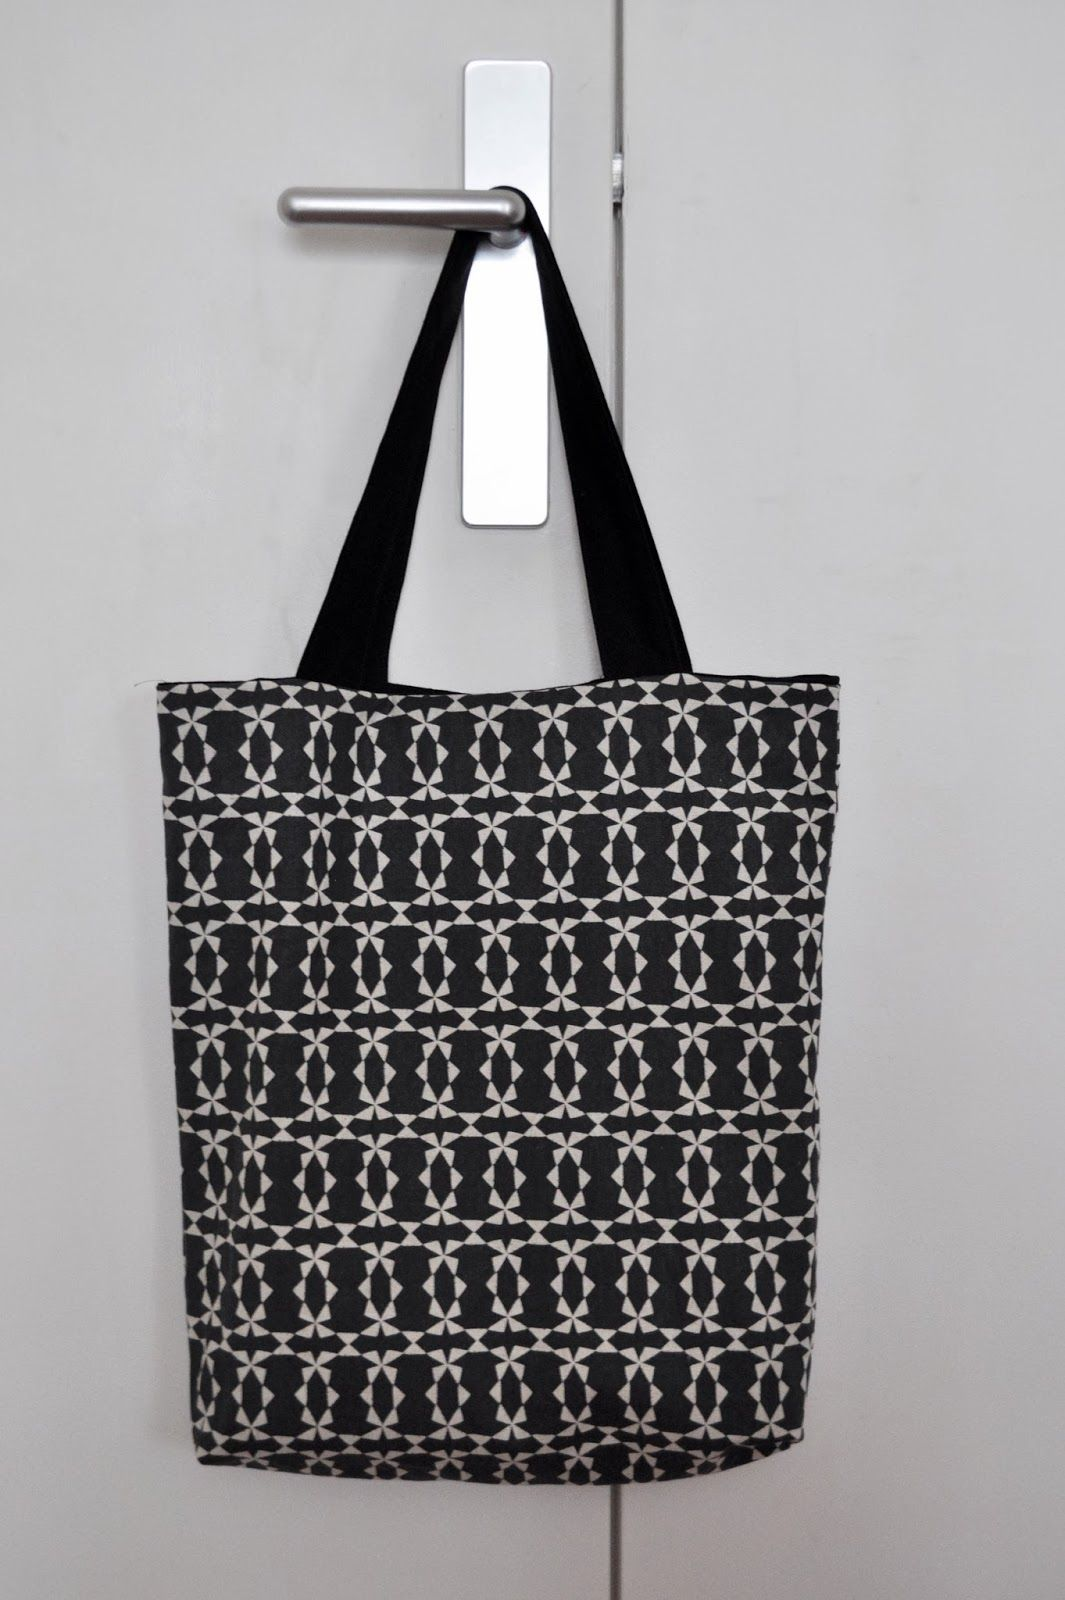 tuto tote bag r versible couture pinterest patron de. Black Bedroom Furniture Sets. Home Design Ideas